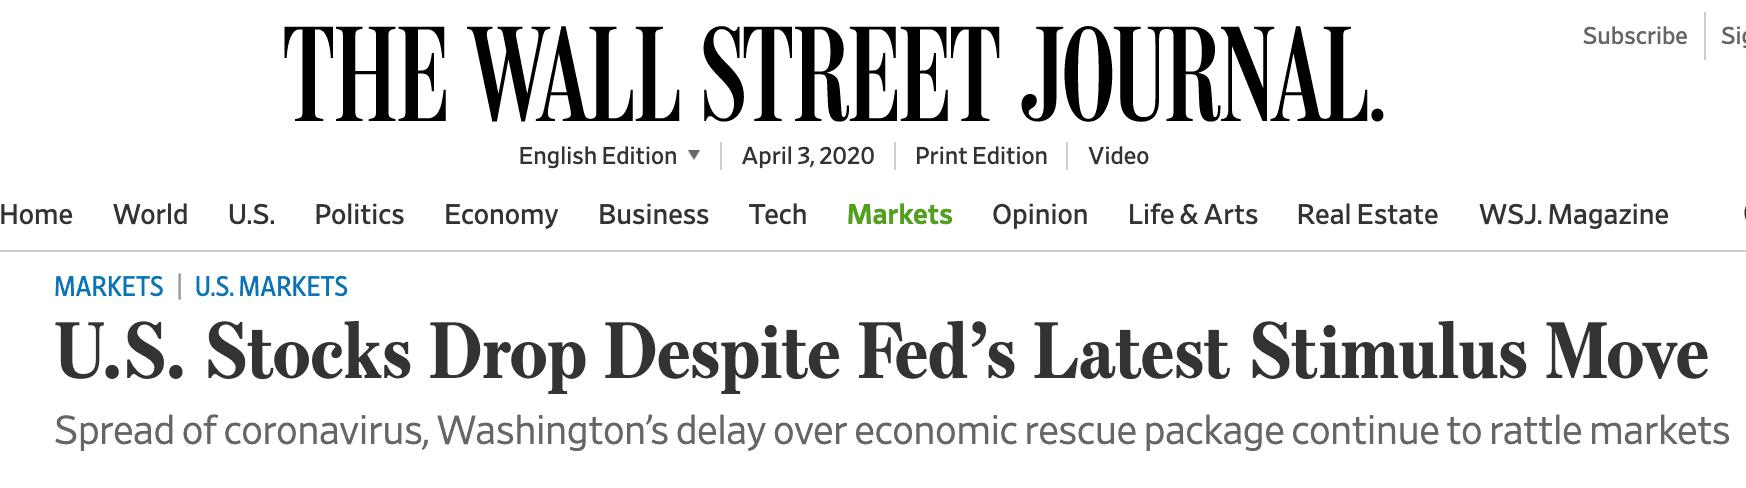 "Wall street journal headline - US Stocks fall ""despite"" something"